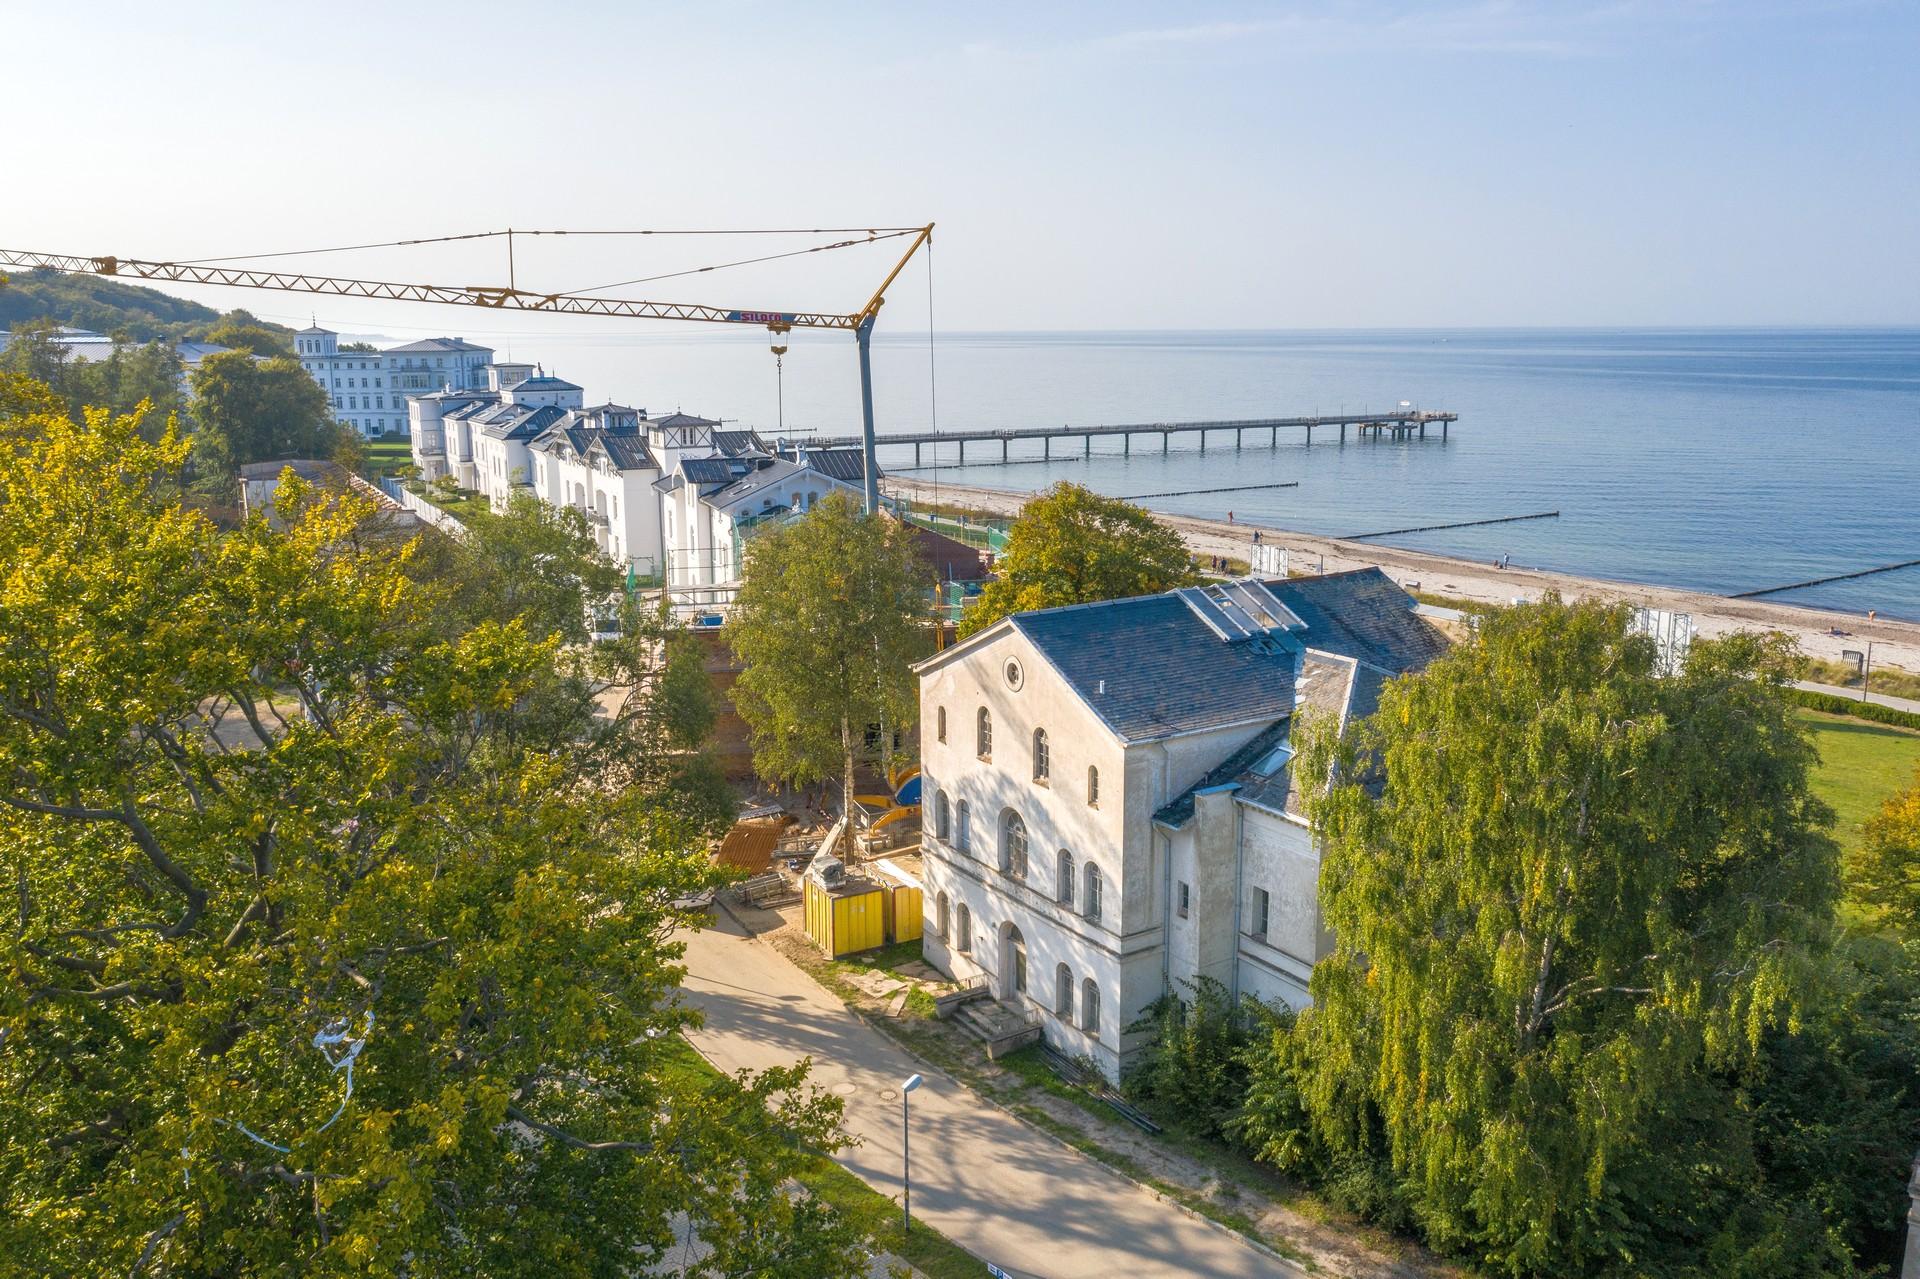 Immobilienfotograf Weilburg Drohne